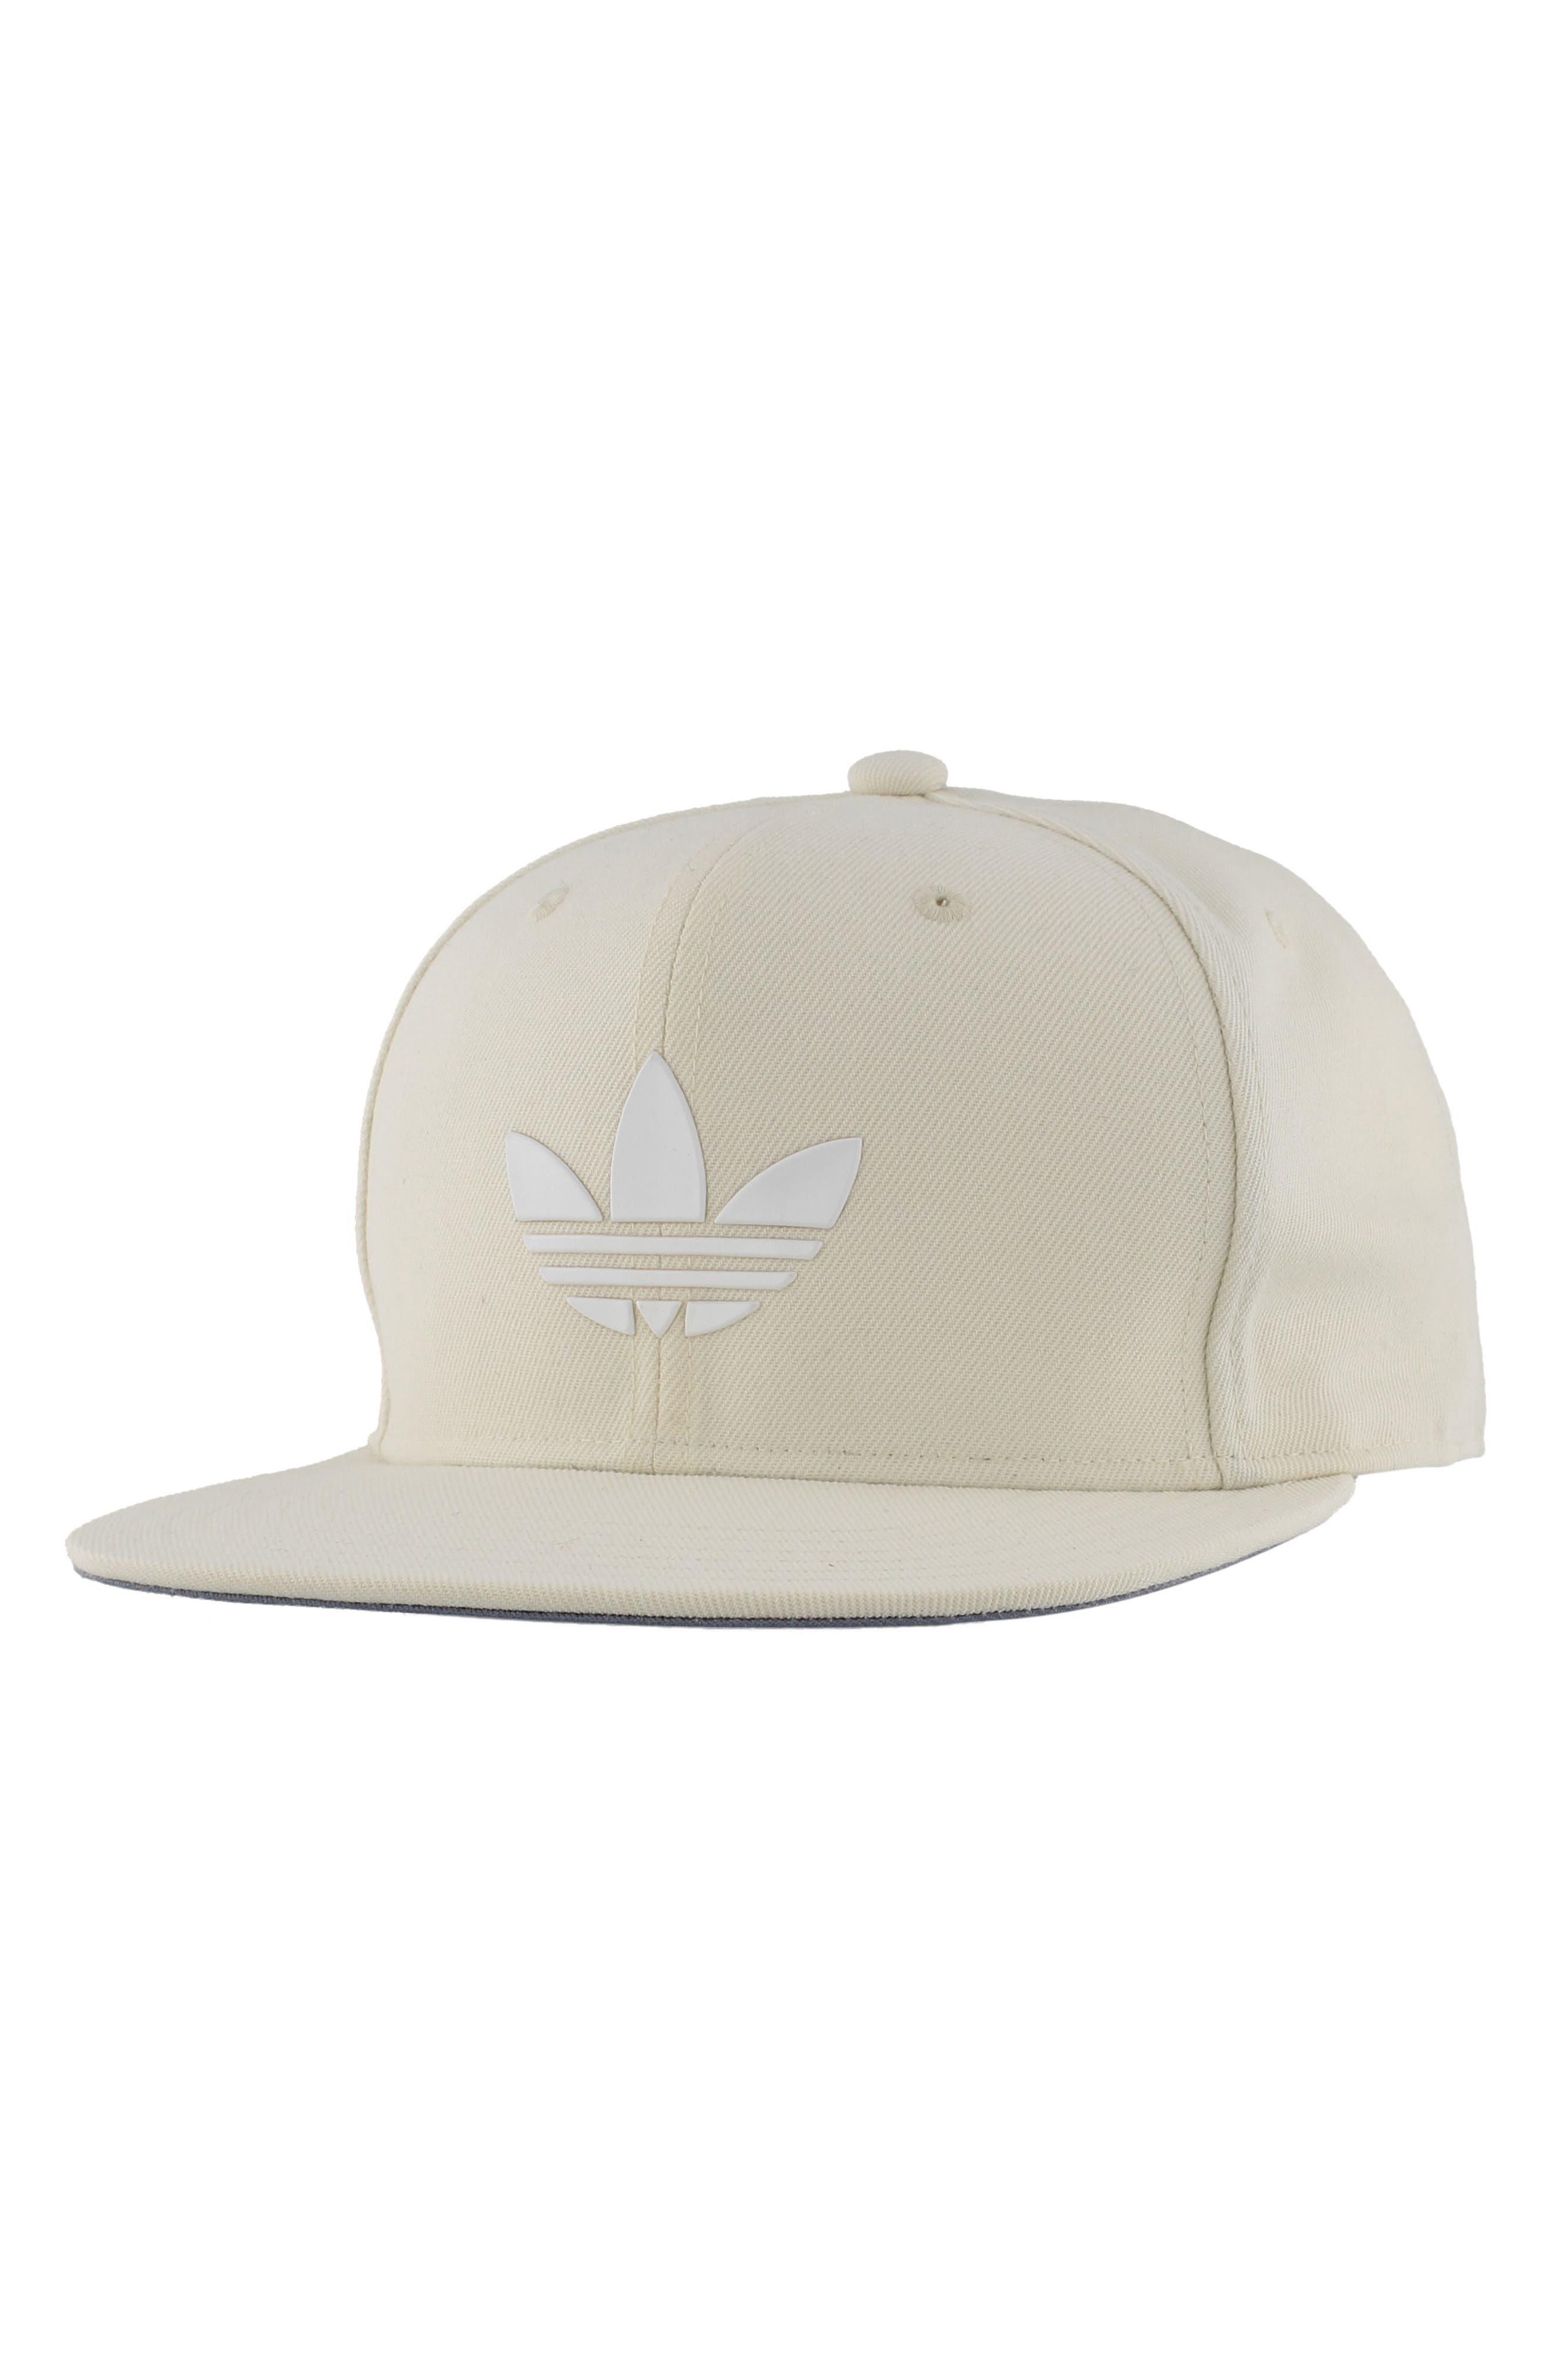 Main Image - adidas Originals Ori Trefoil Plus Snapback Baseball Cap